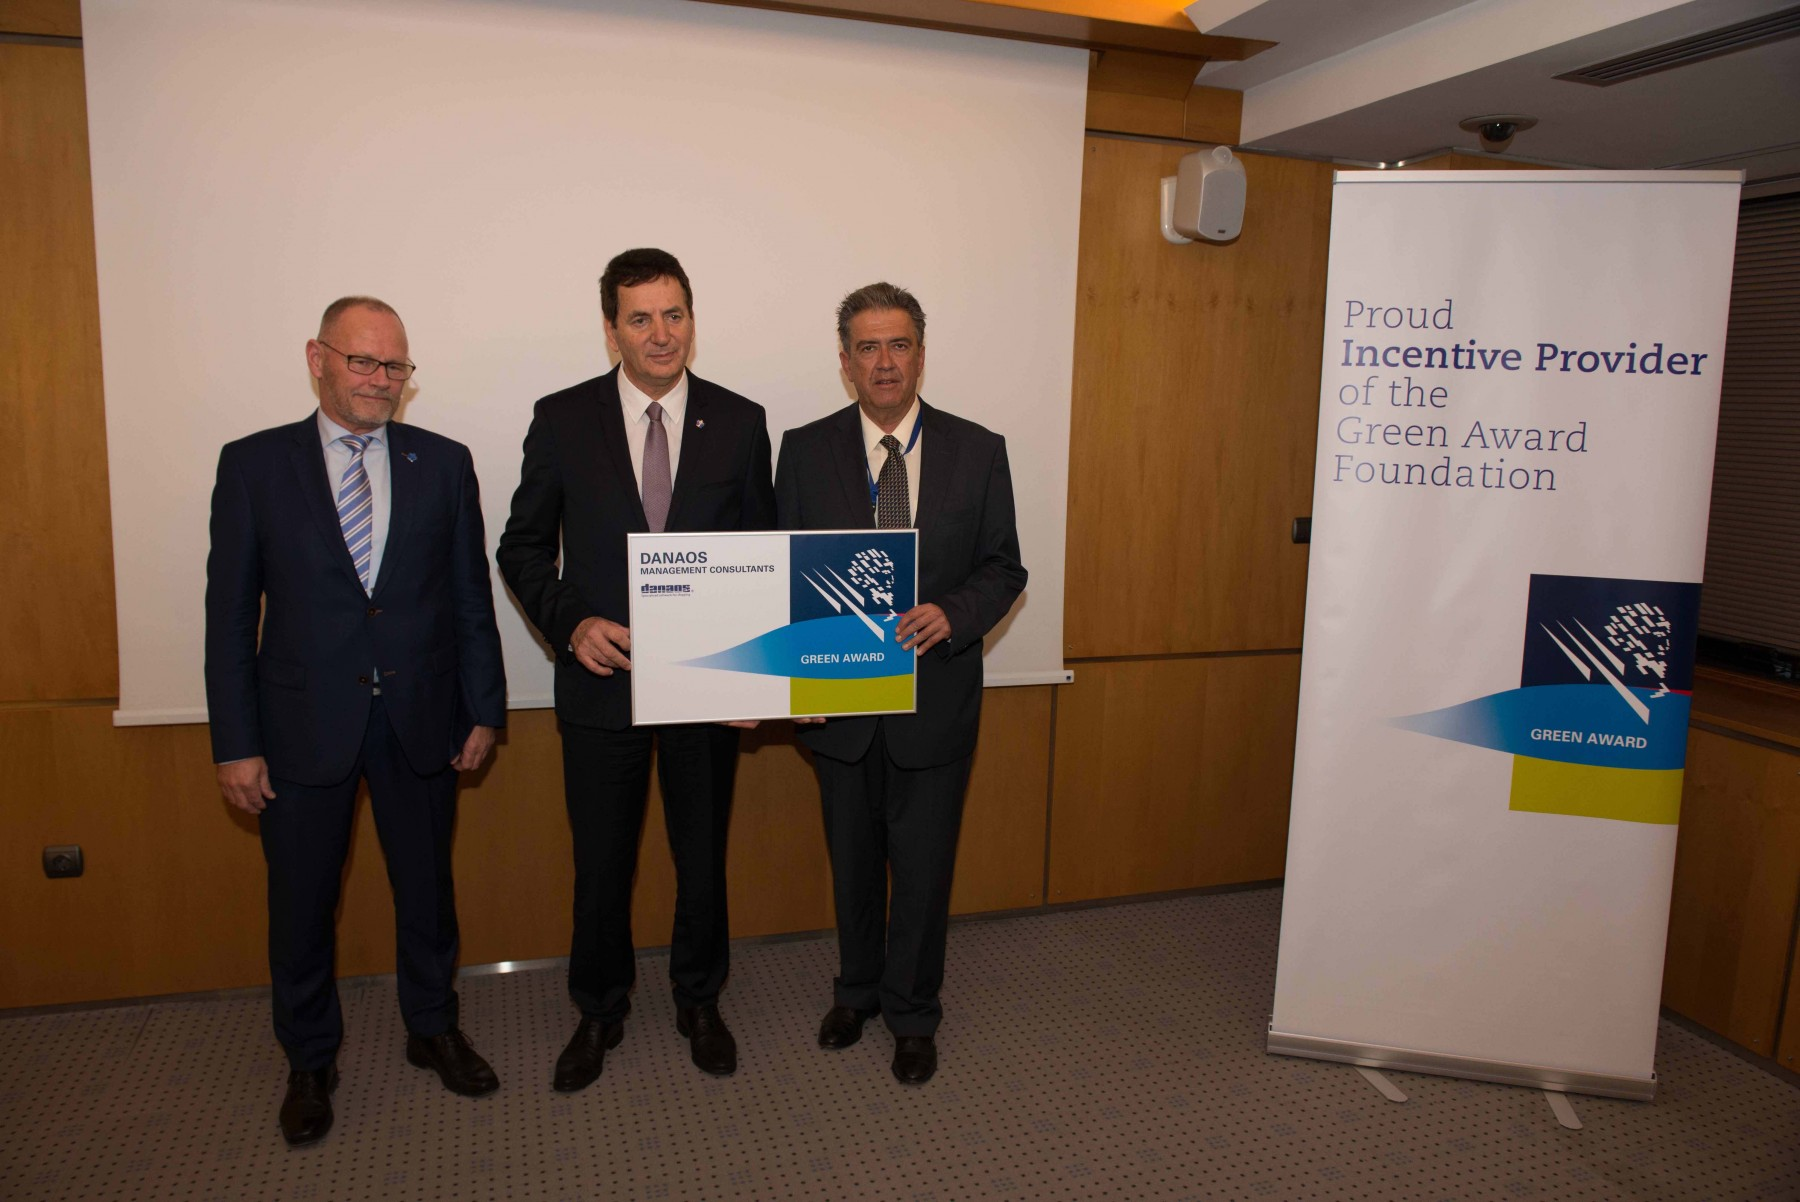 H DANAOS Management Consultants εντάχθηκε στο πρόγραμμα των Green Awards